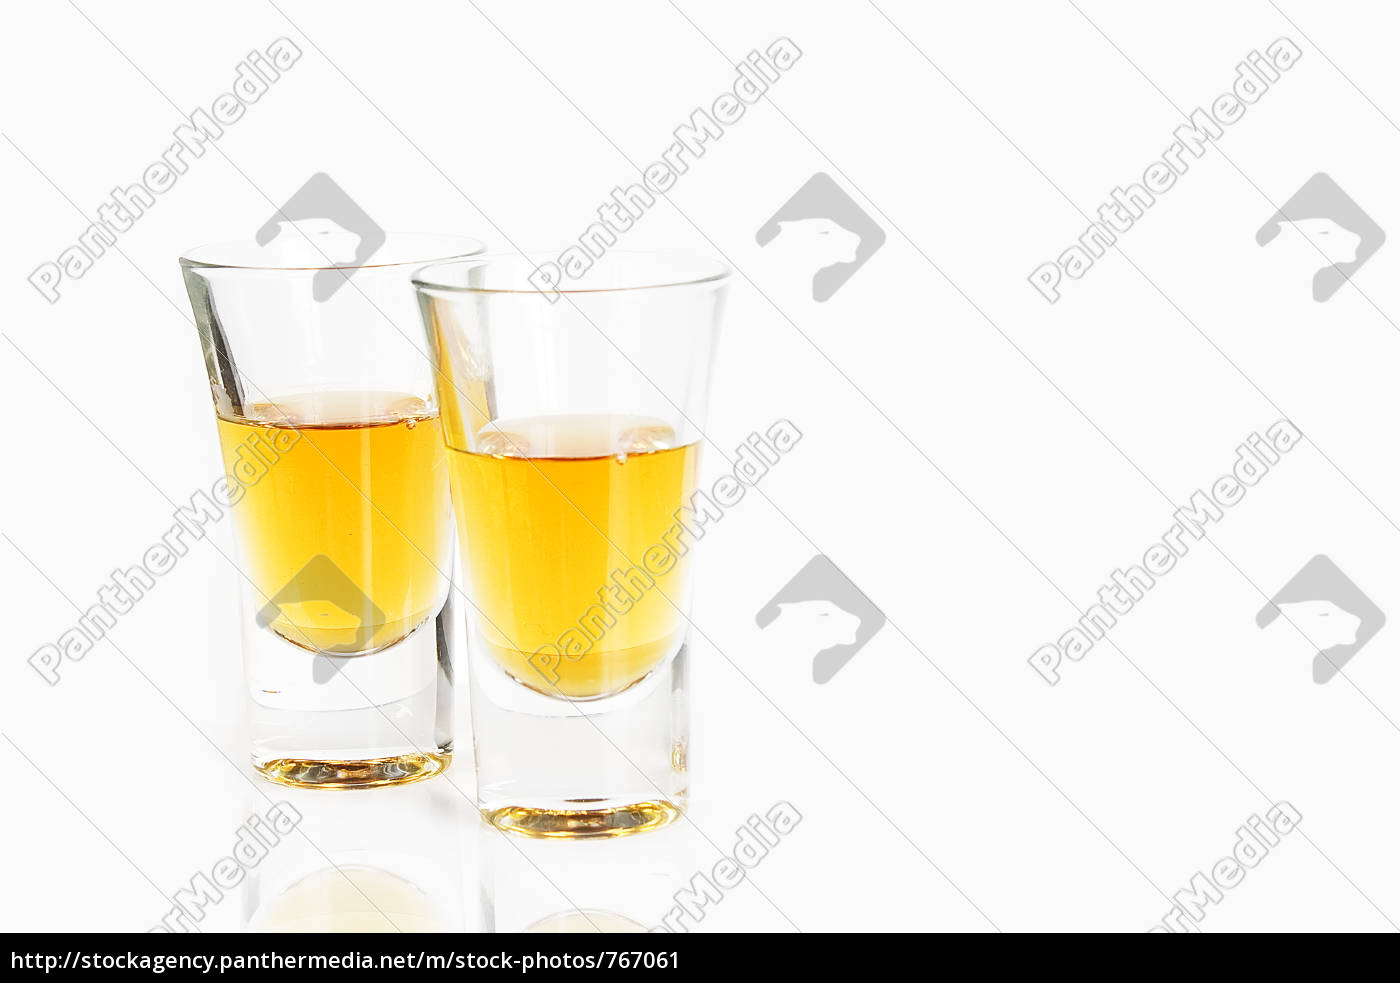 liqueur - 767061